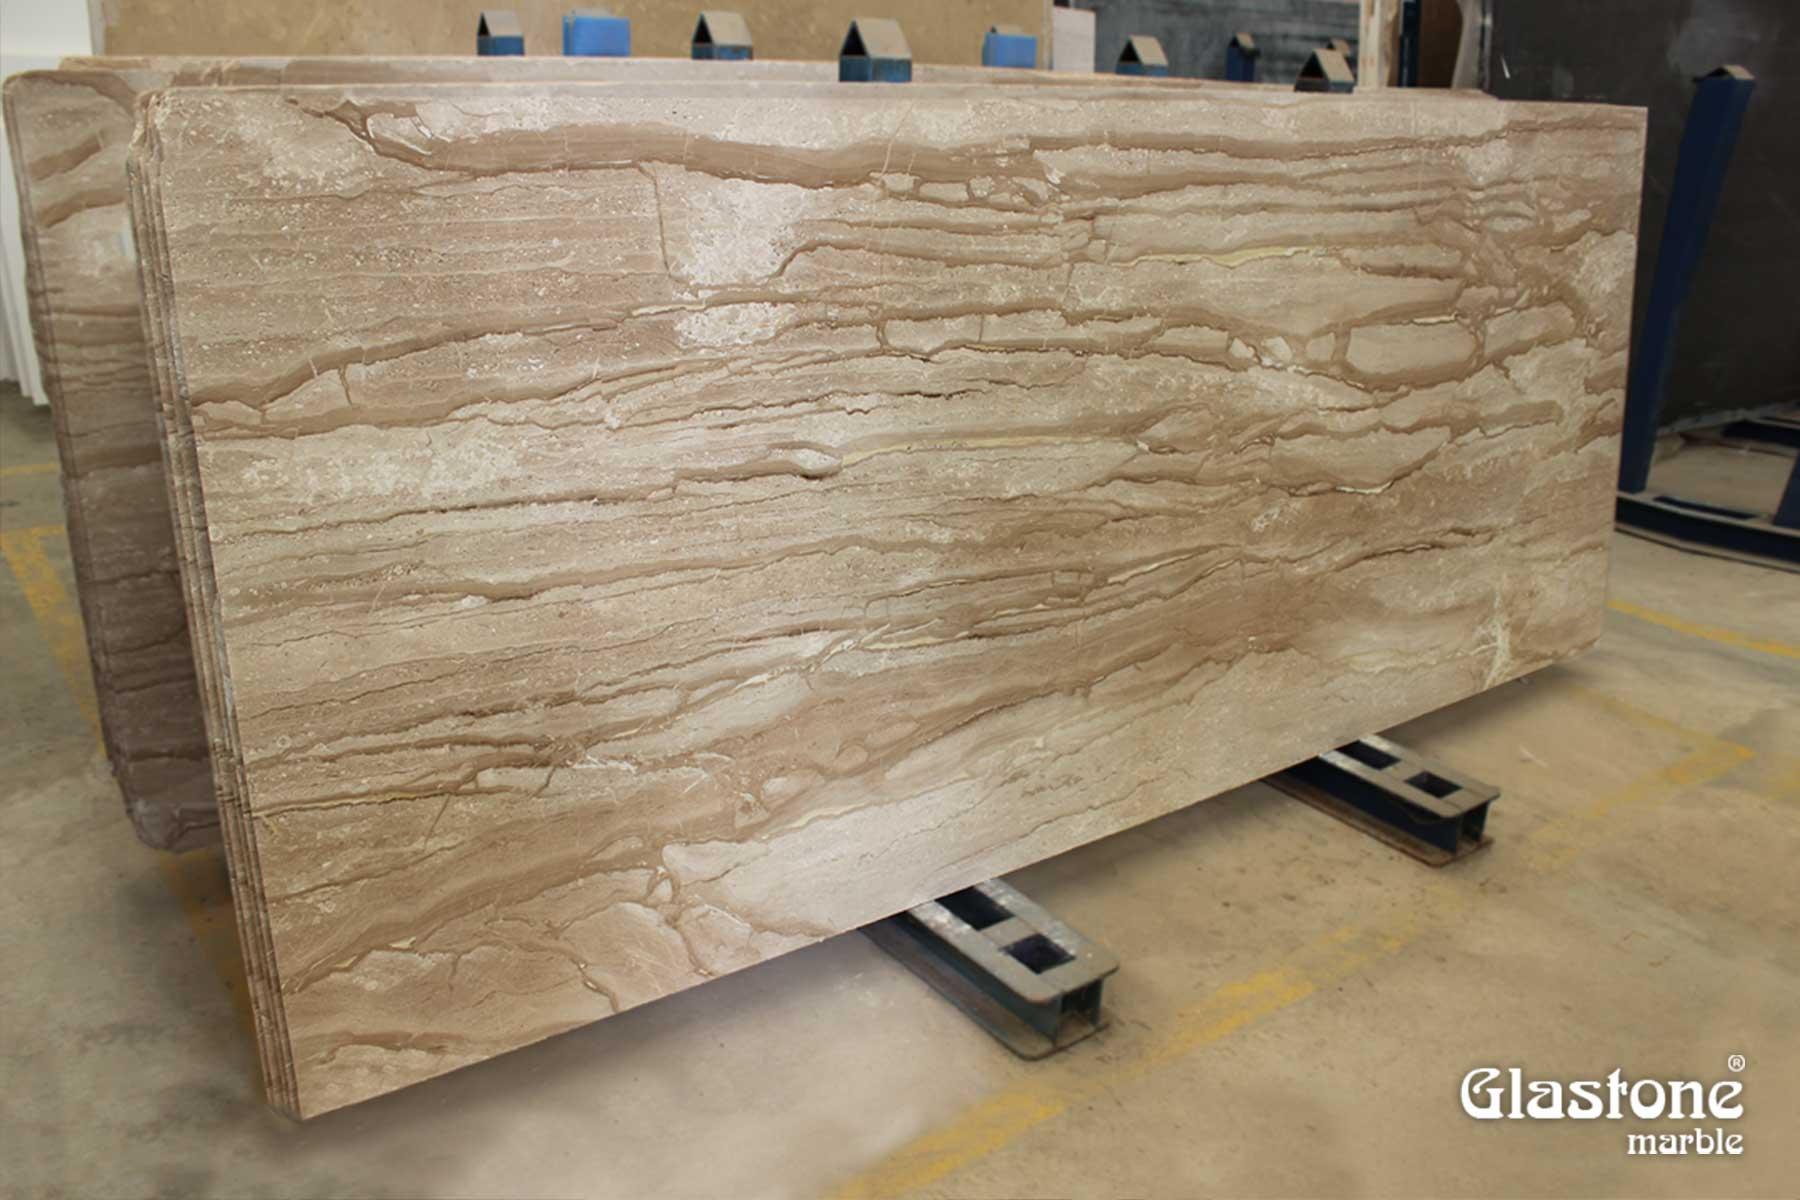 glastone marble marmol solerialaminado vidrio marmol natural daino reale